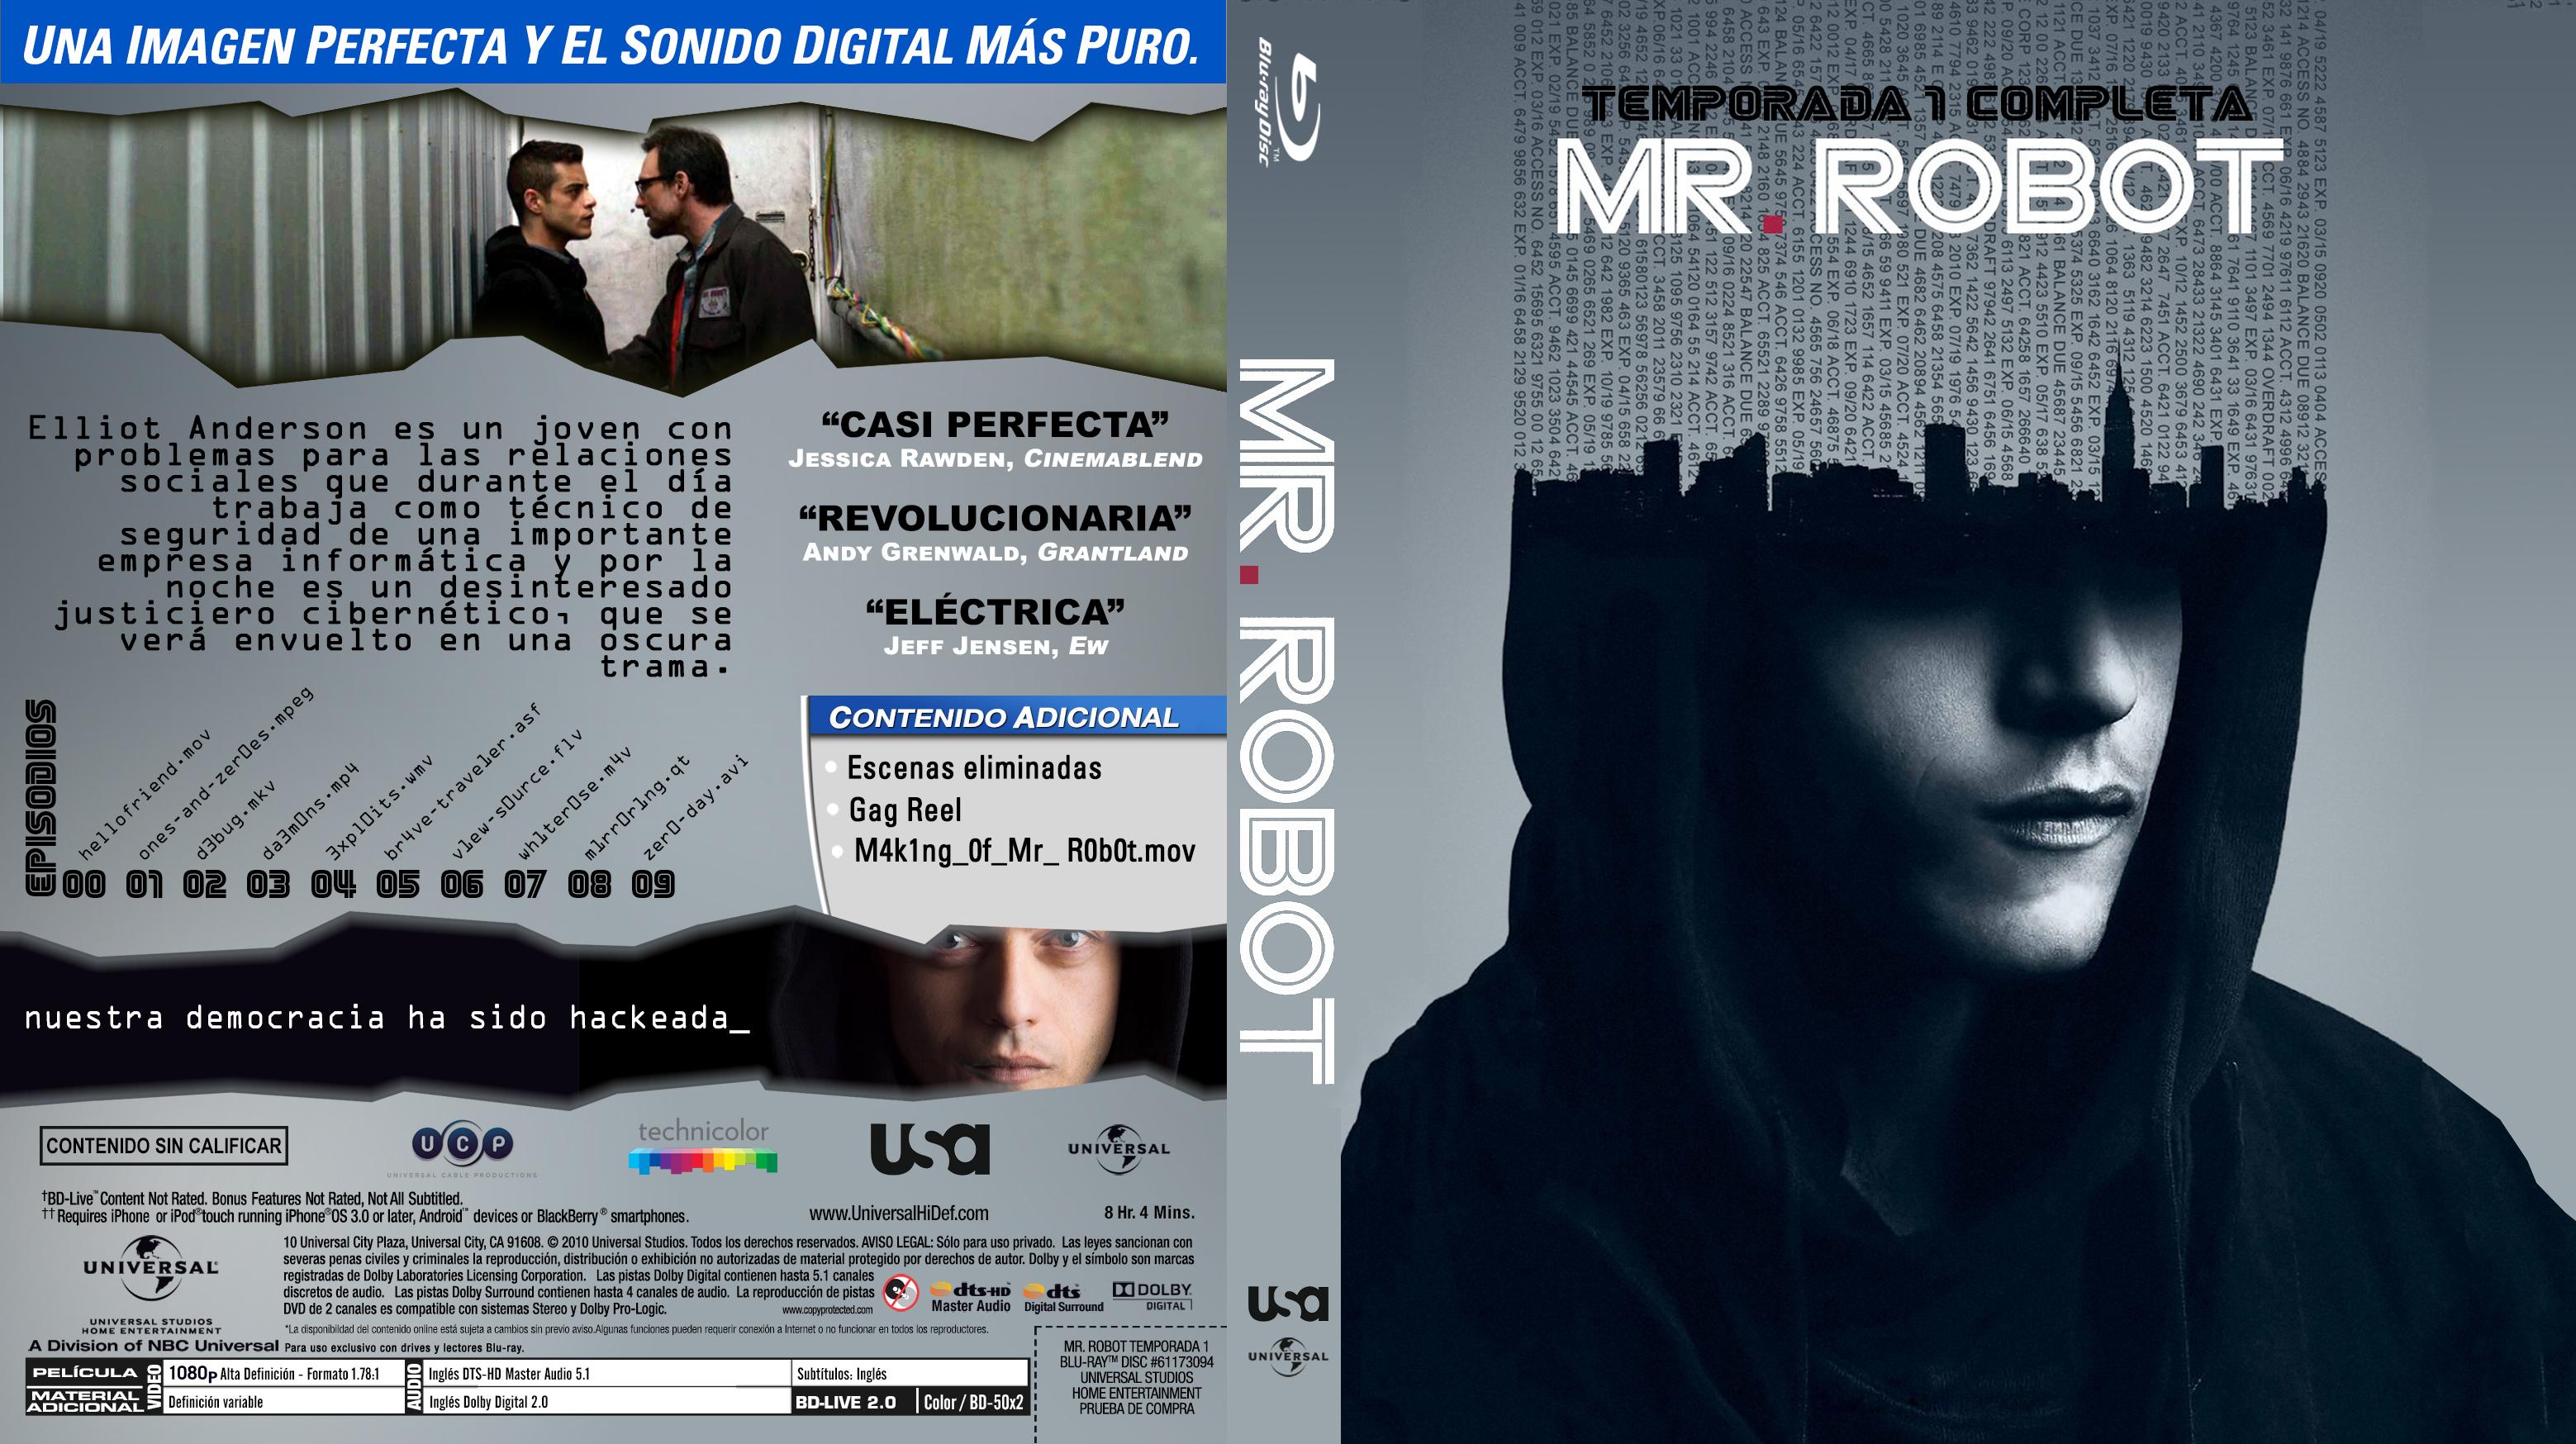 Mr Robot Staffel 1 Folge 1